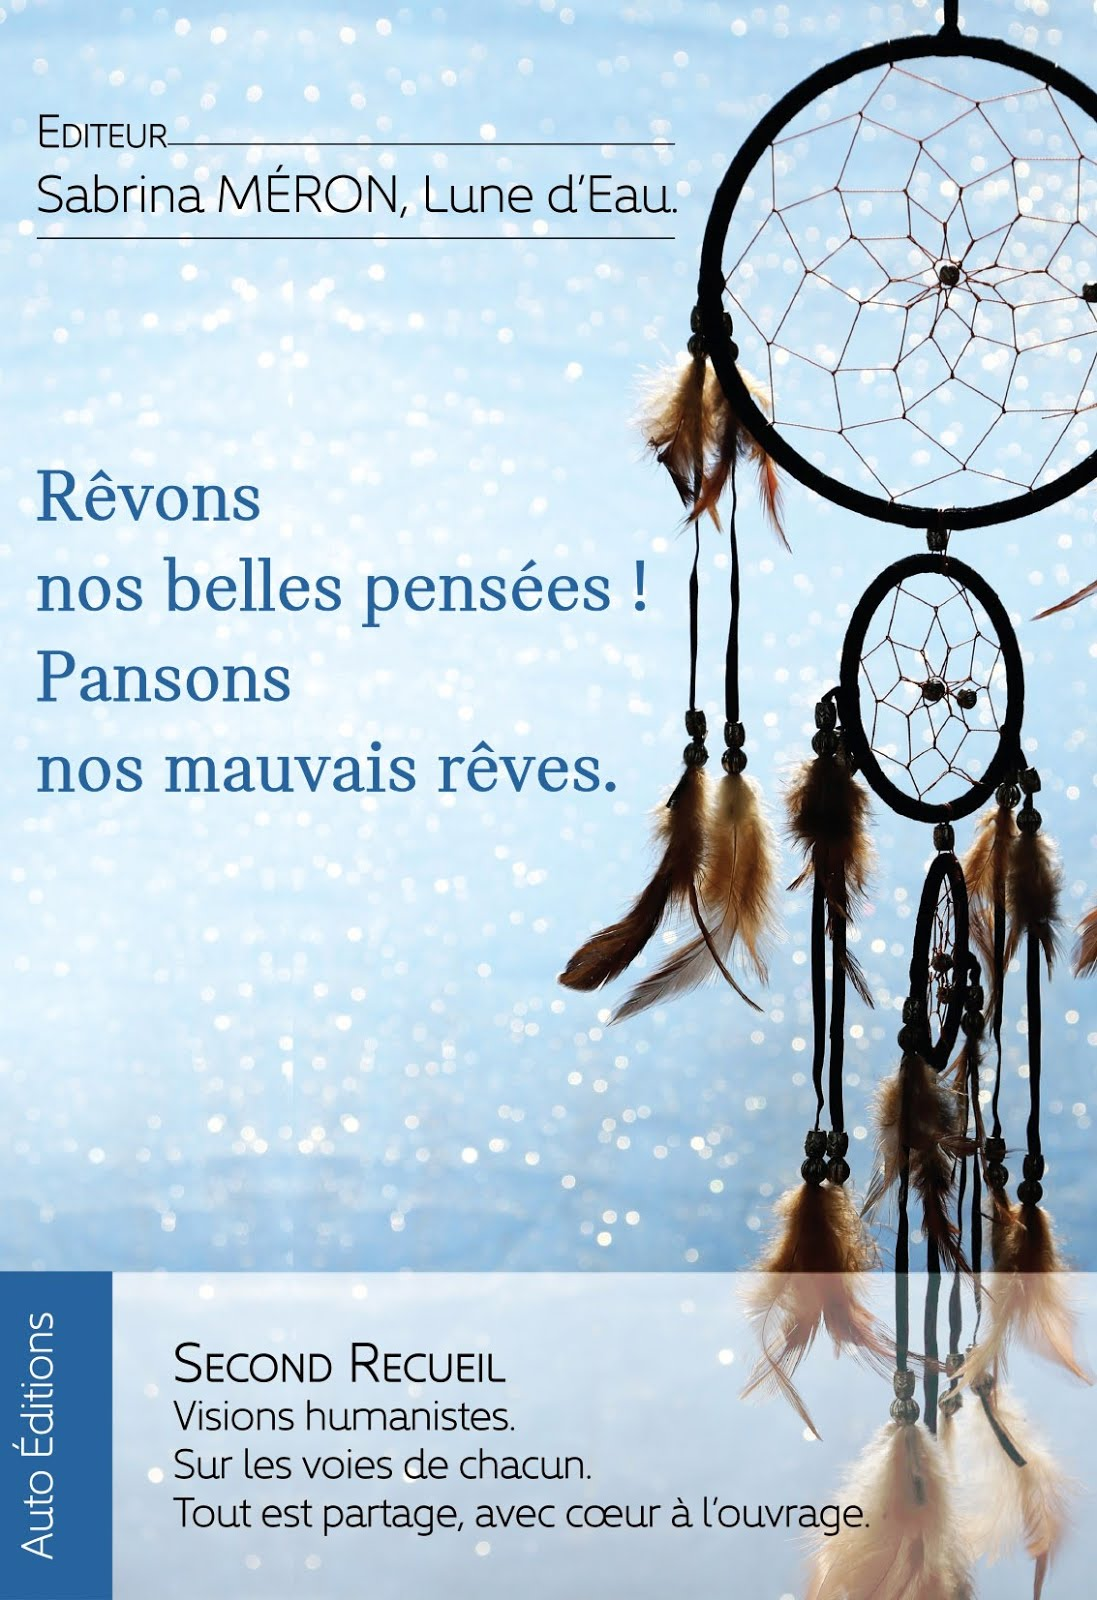 REVONS NOS BELLES PENSEES